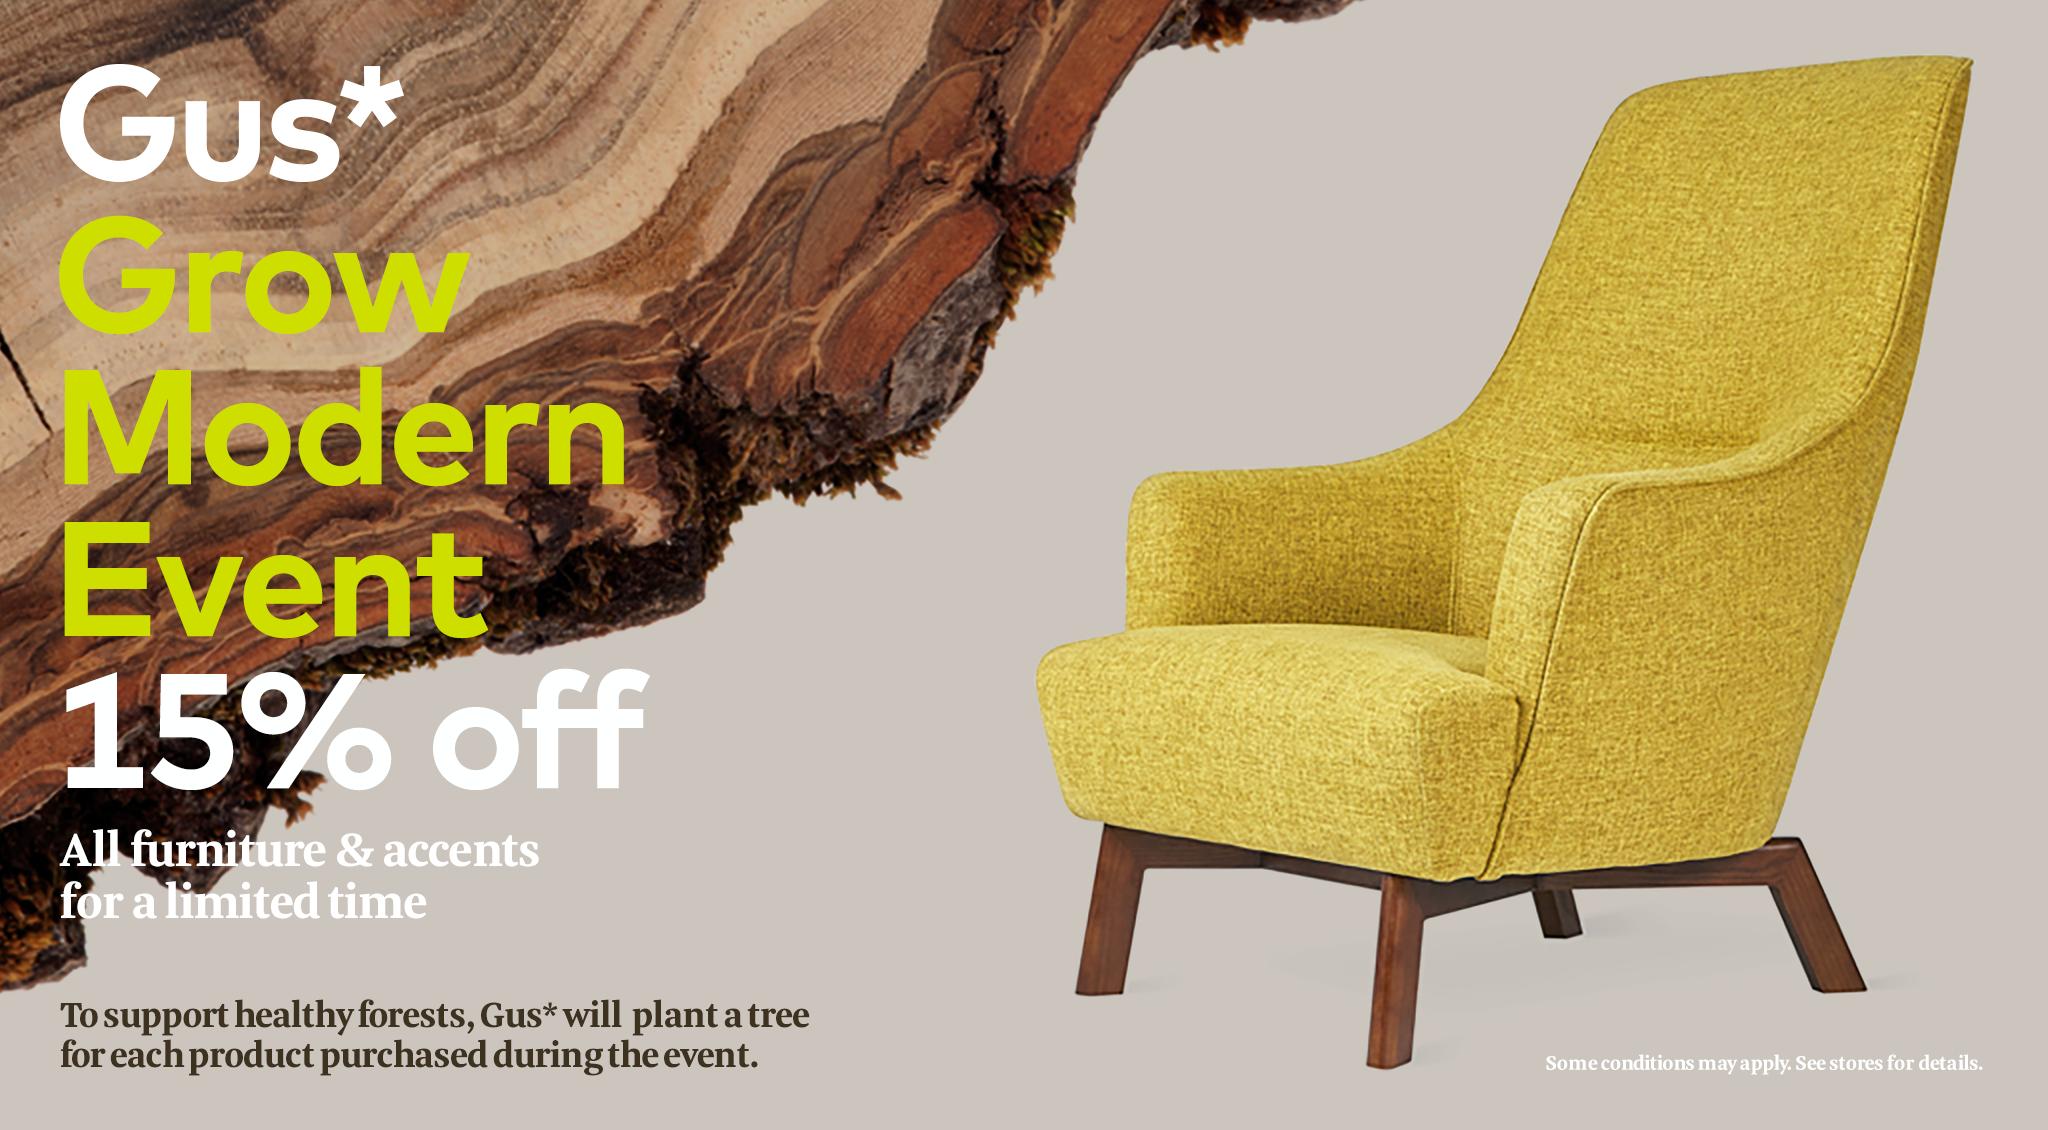 EN Web Graphic 3 - PNG - 2048 X 1130 - Crosscut Hilary Chair.png